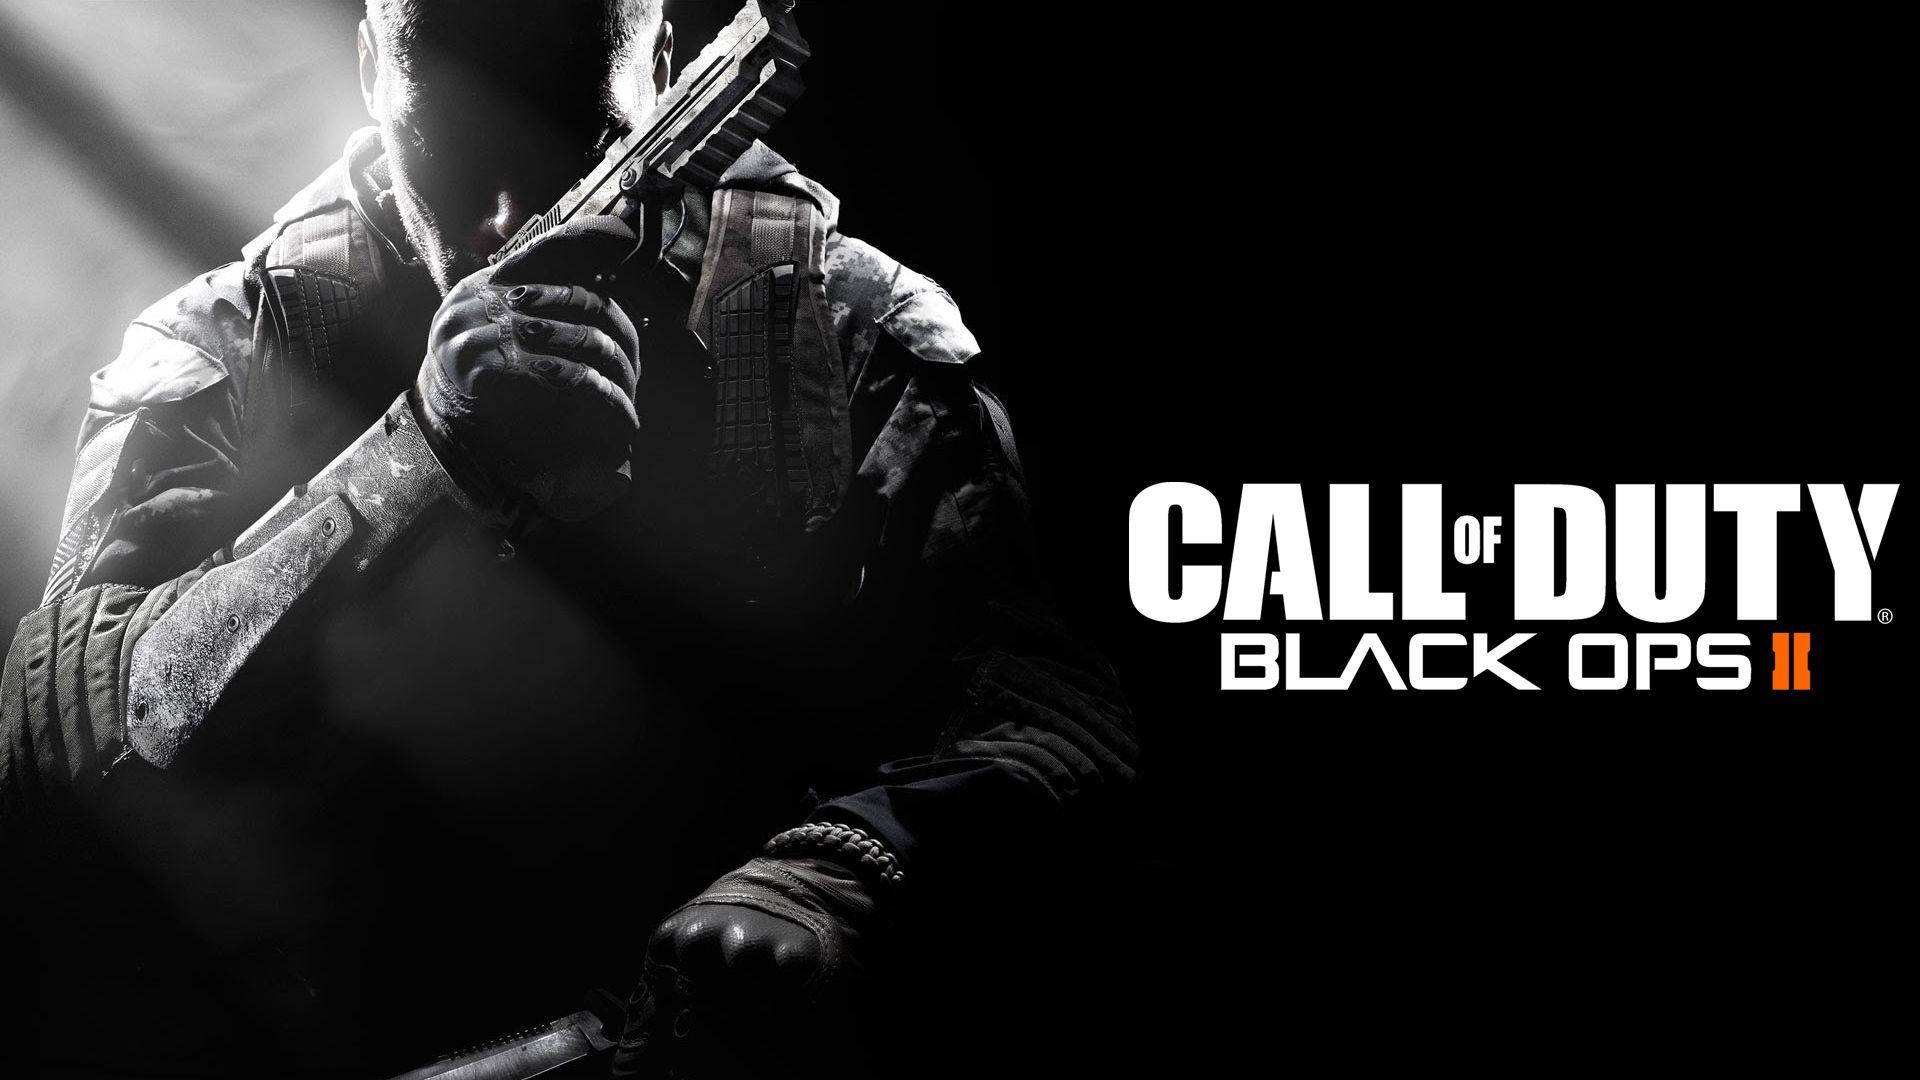 Call Of Duty Black Ops Ii Xbox One Backwards Compatibility Errors